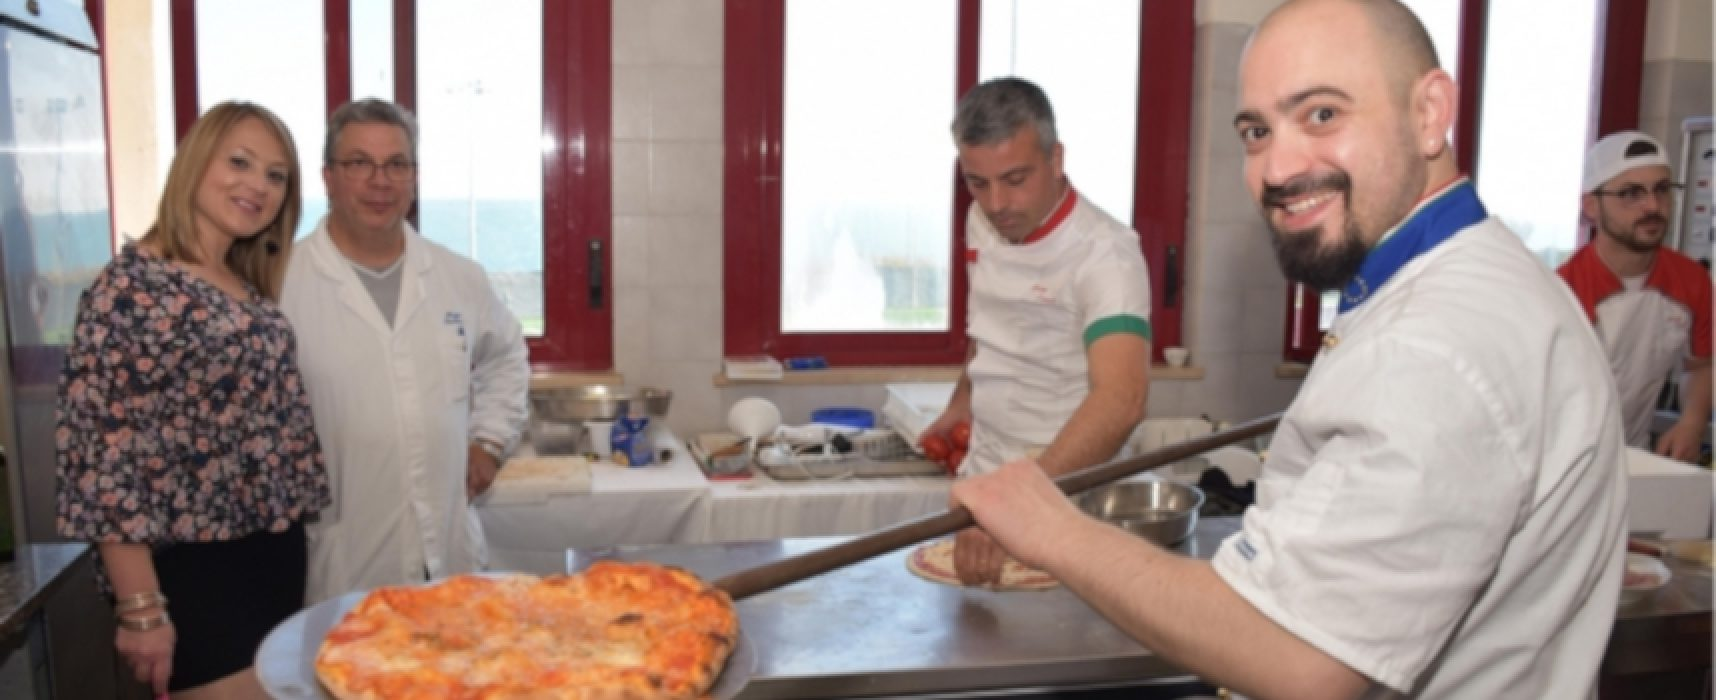 Pizzaiolo biscegliese spiega tecniche di lievitazione naturale agli studenti canadesi